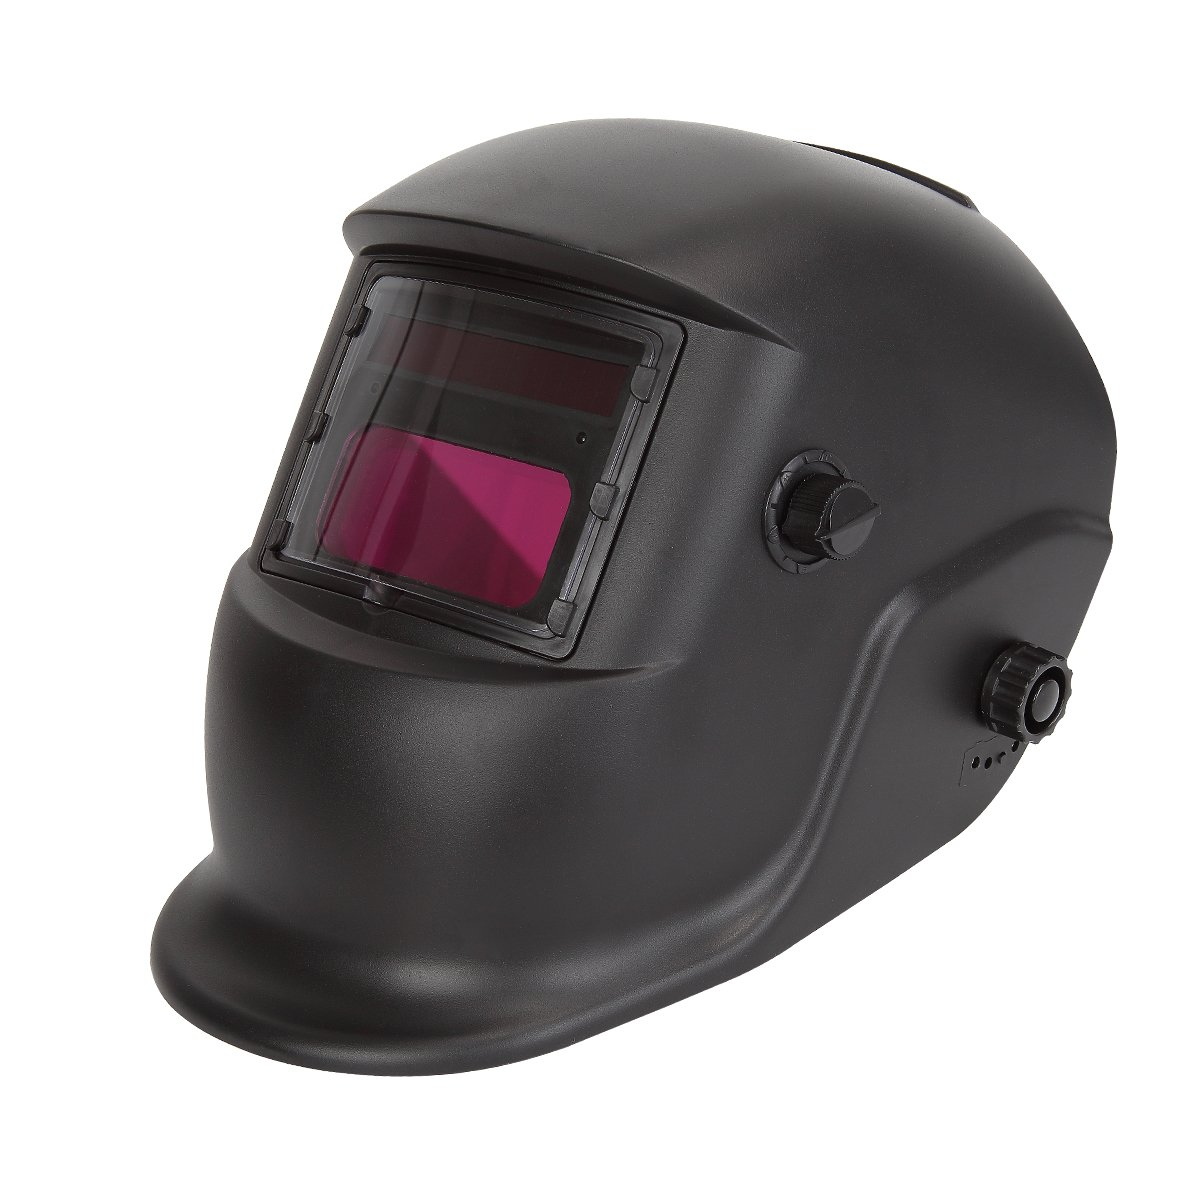 Colyn Solar Powered Welder Helmet w/Auto Darkening Hood and Adjustable Shade Sensitivity – 9-13/5-14 Range Mask for ARC MIG TIG Welding Machine – Black